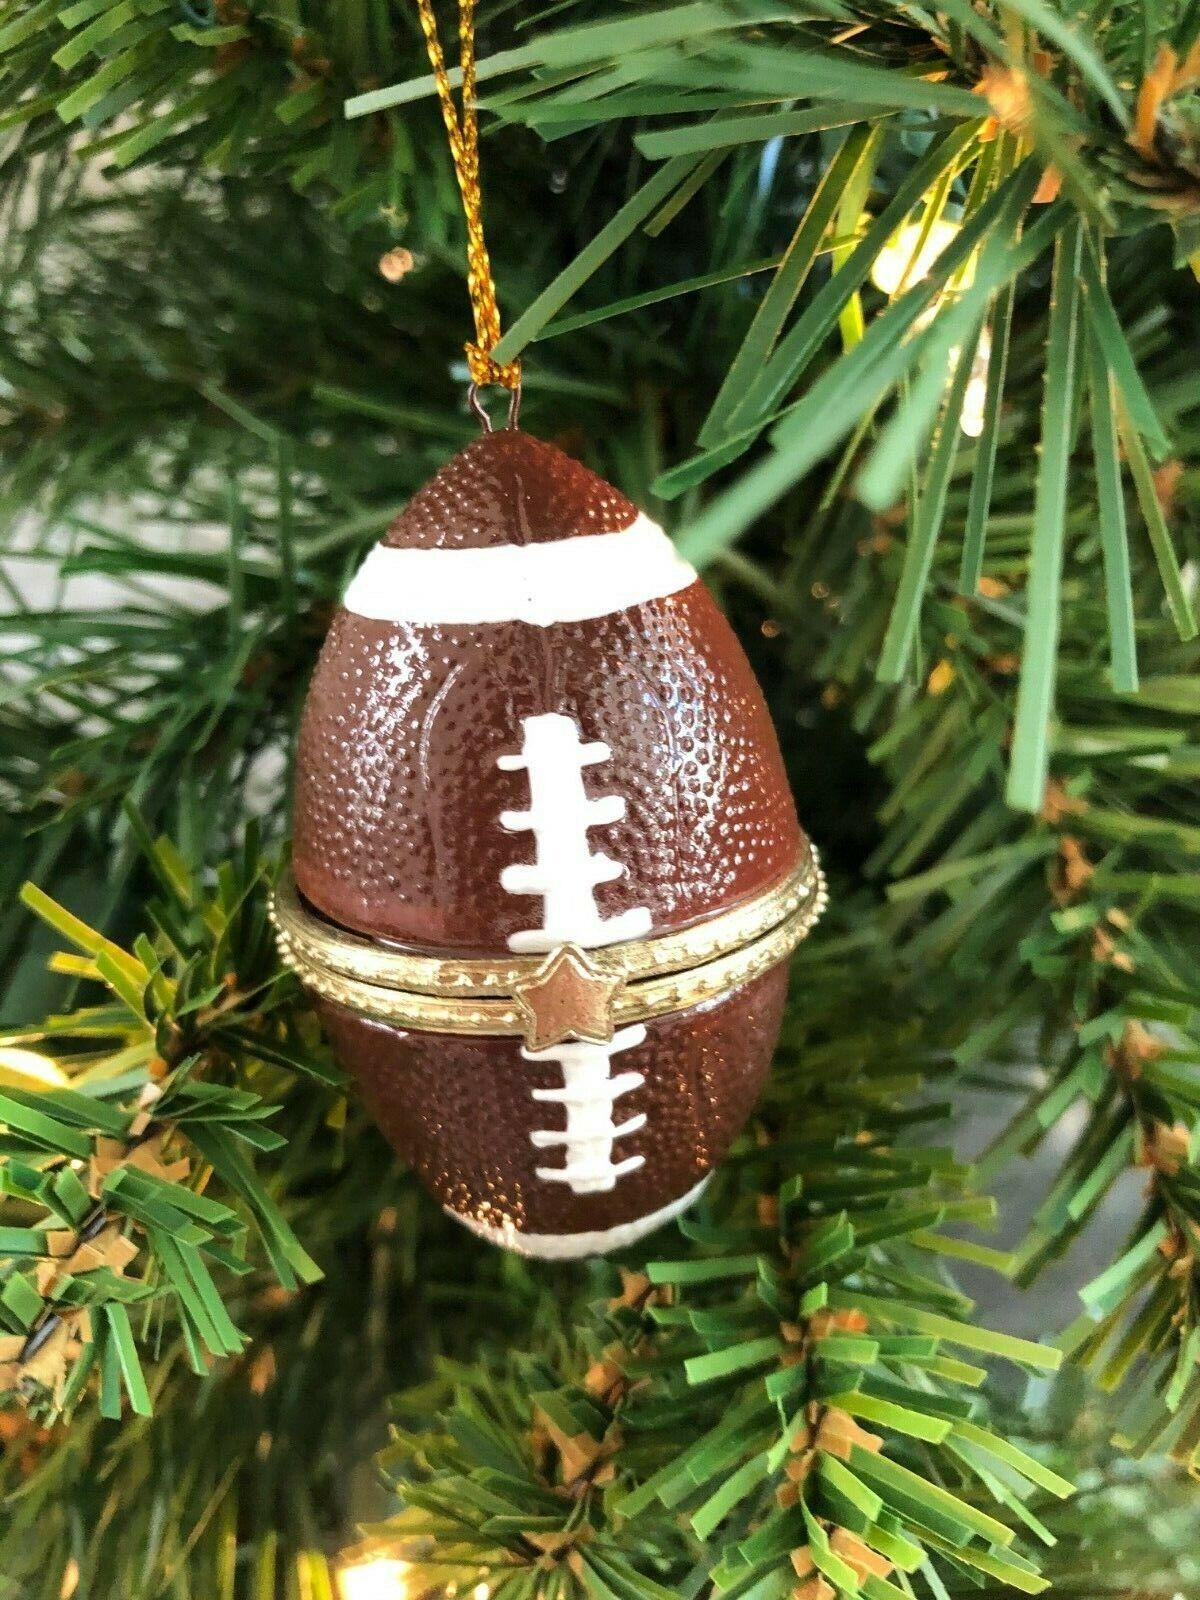 Christmas Ornament Football Hinged Trinket Box Ornament Porcelain Gift Handpaint Holiday & Seasonal Décor